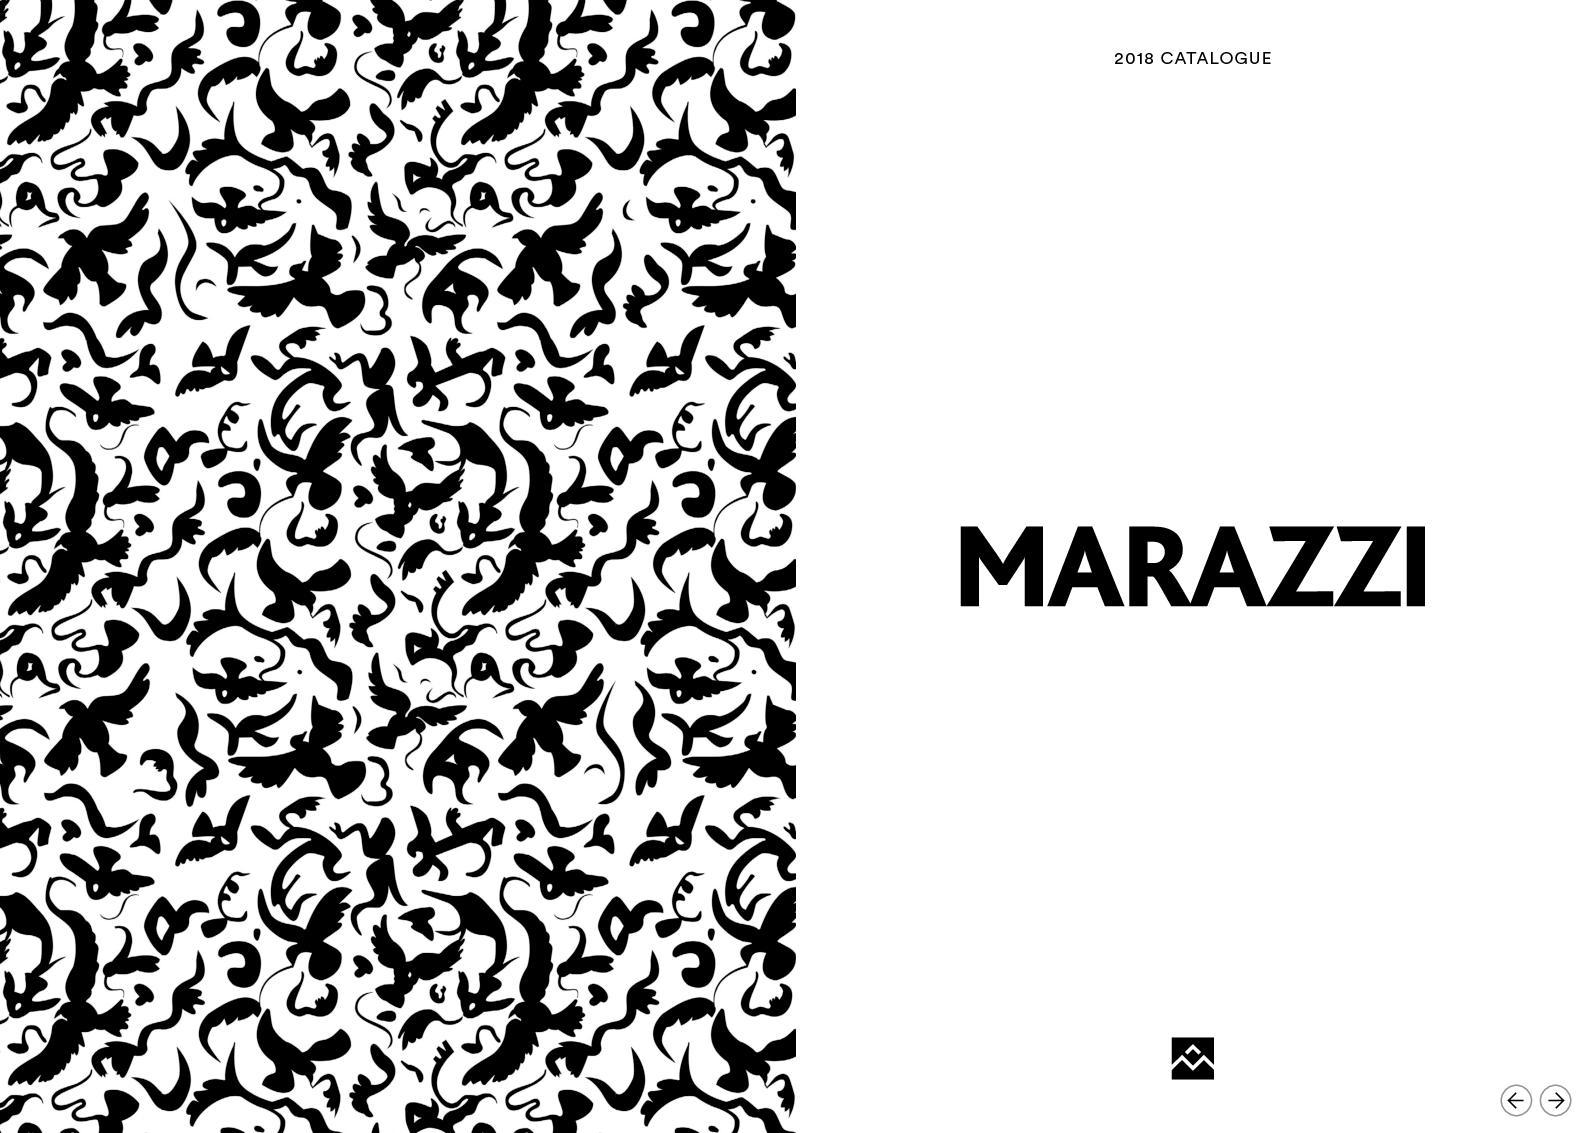 Marazzi Schemi Di Posa calaméo - marazzi